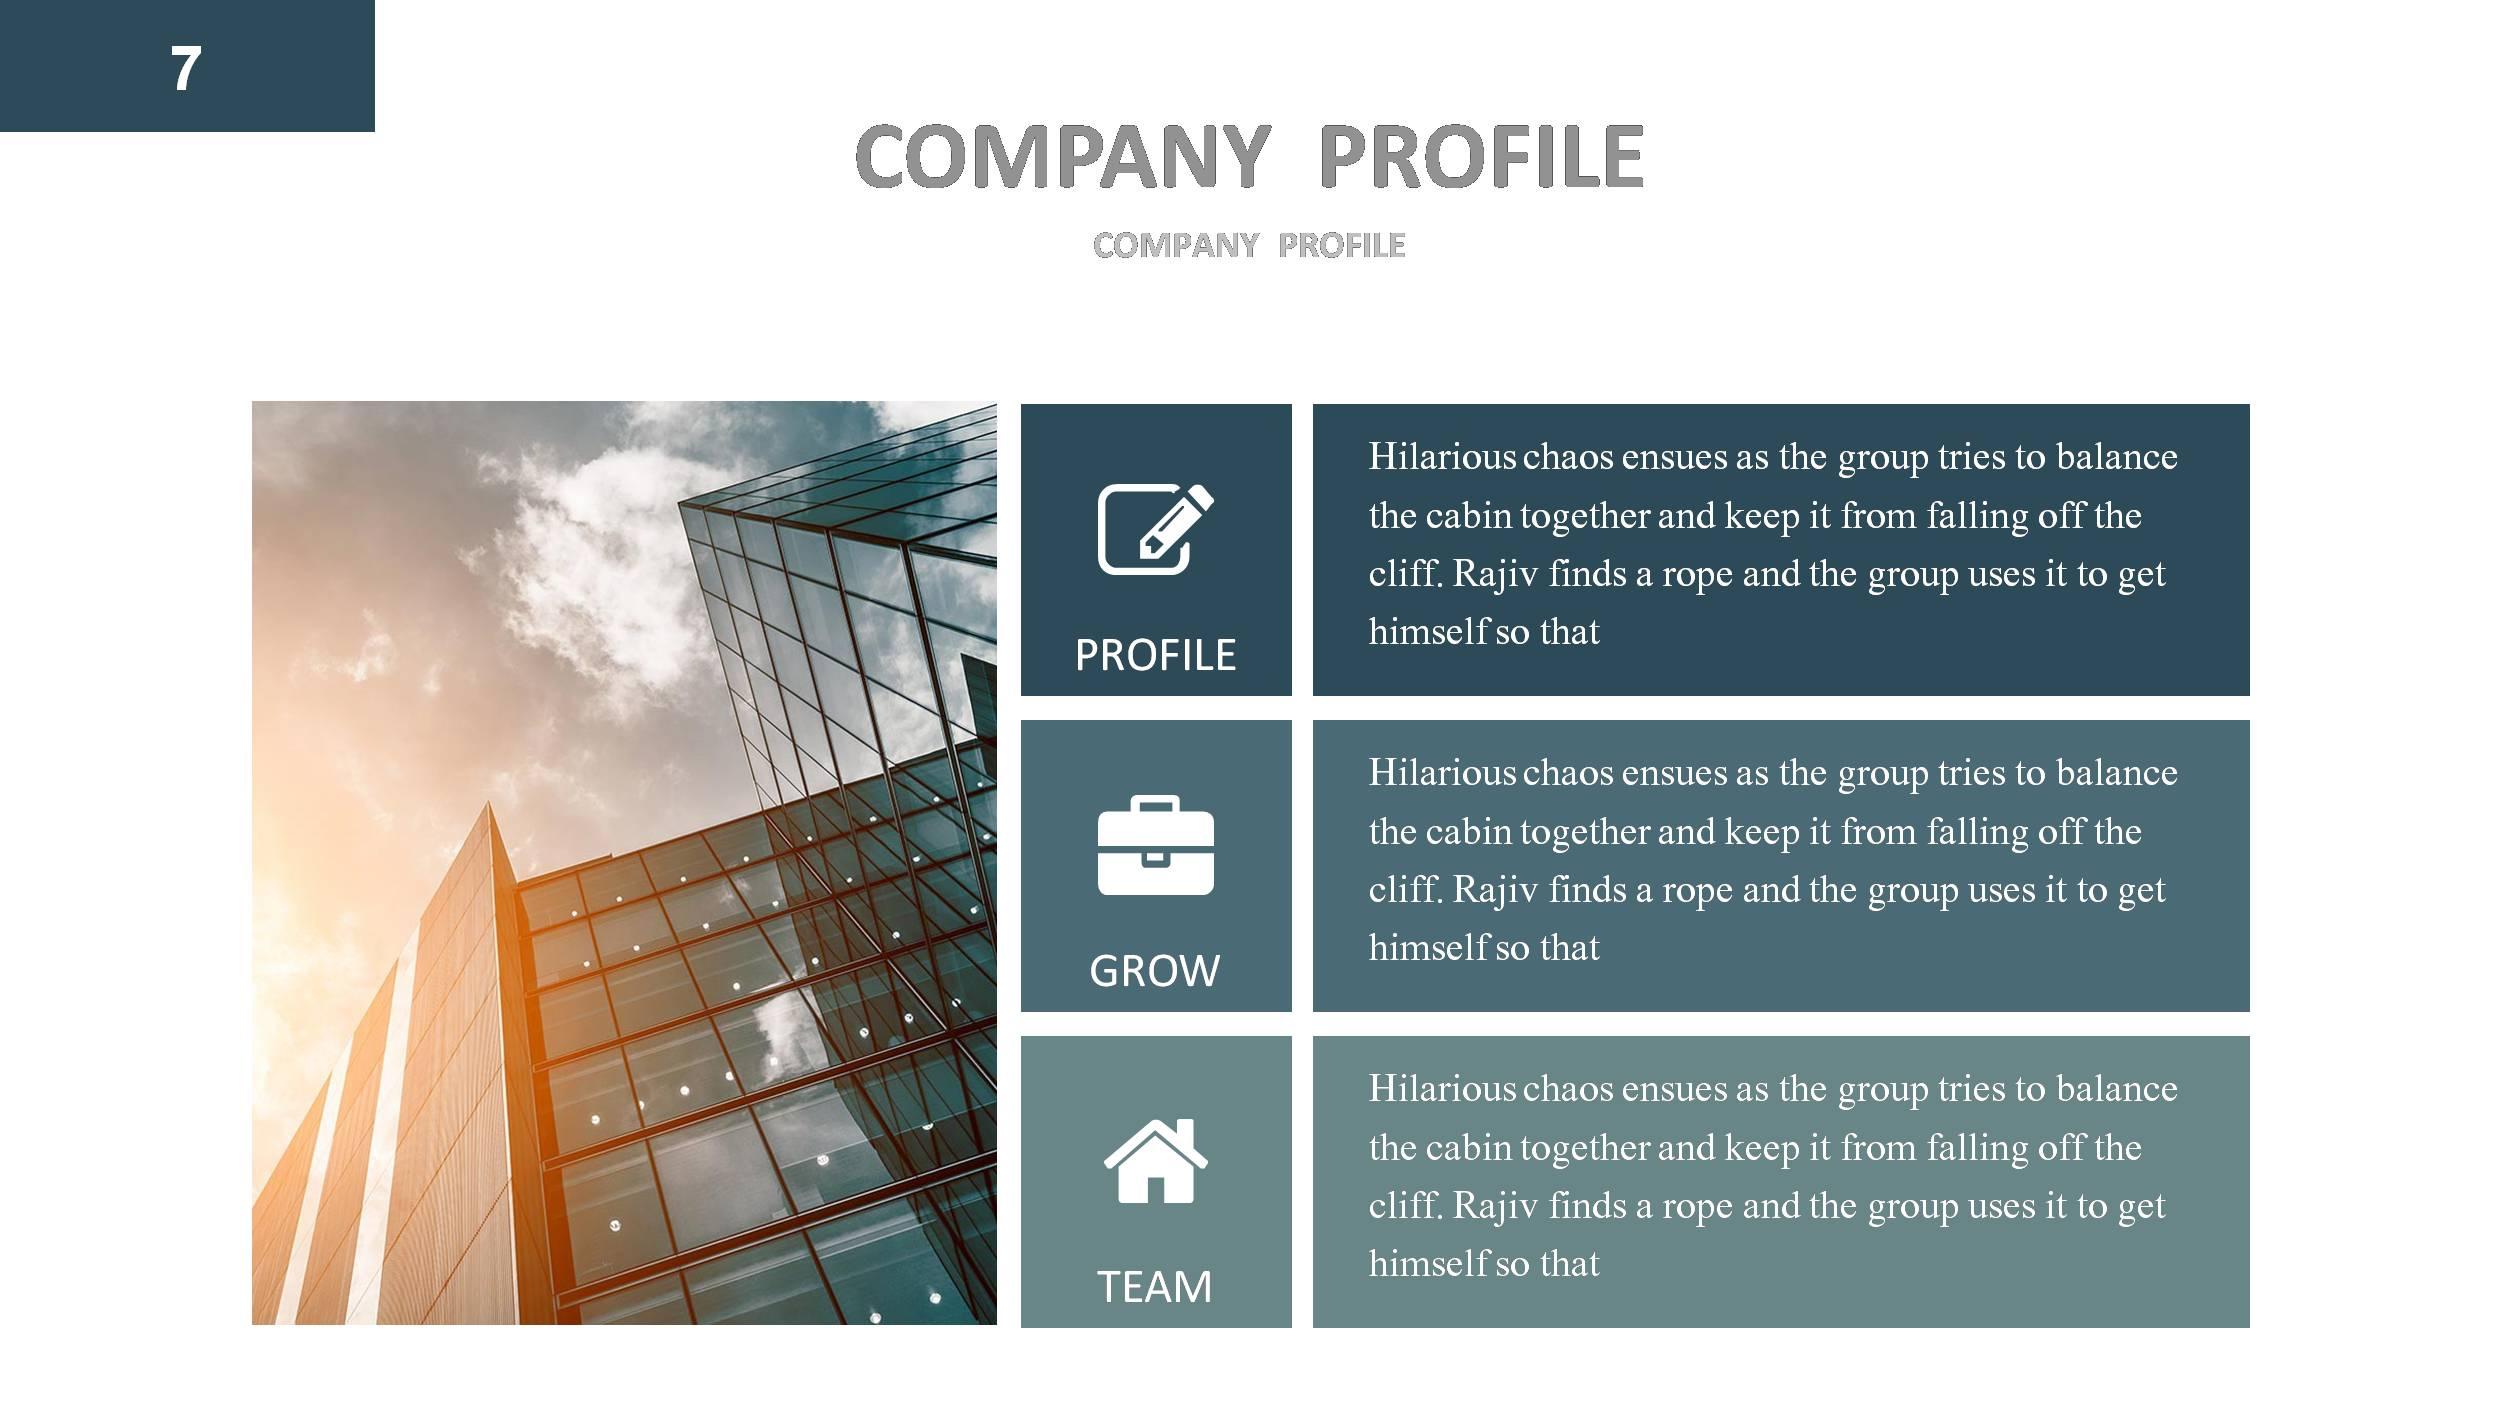 Business profile template solarfm 4 how to write a company profile sample company letterhead altavistaventures Choice Image